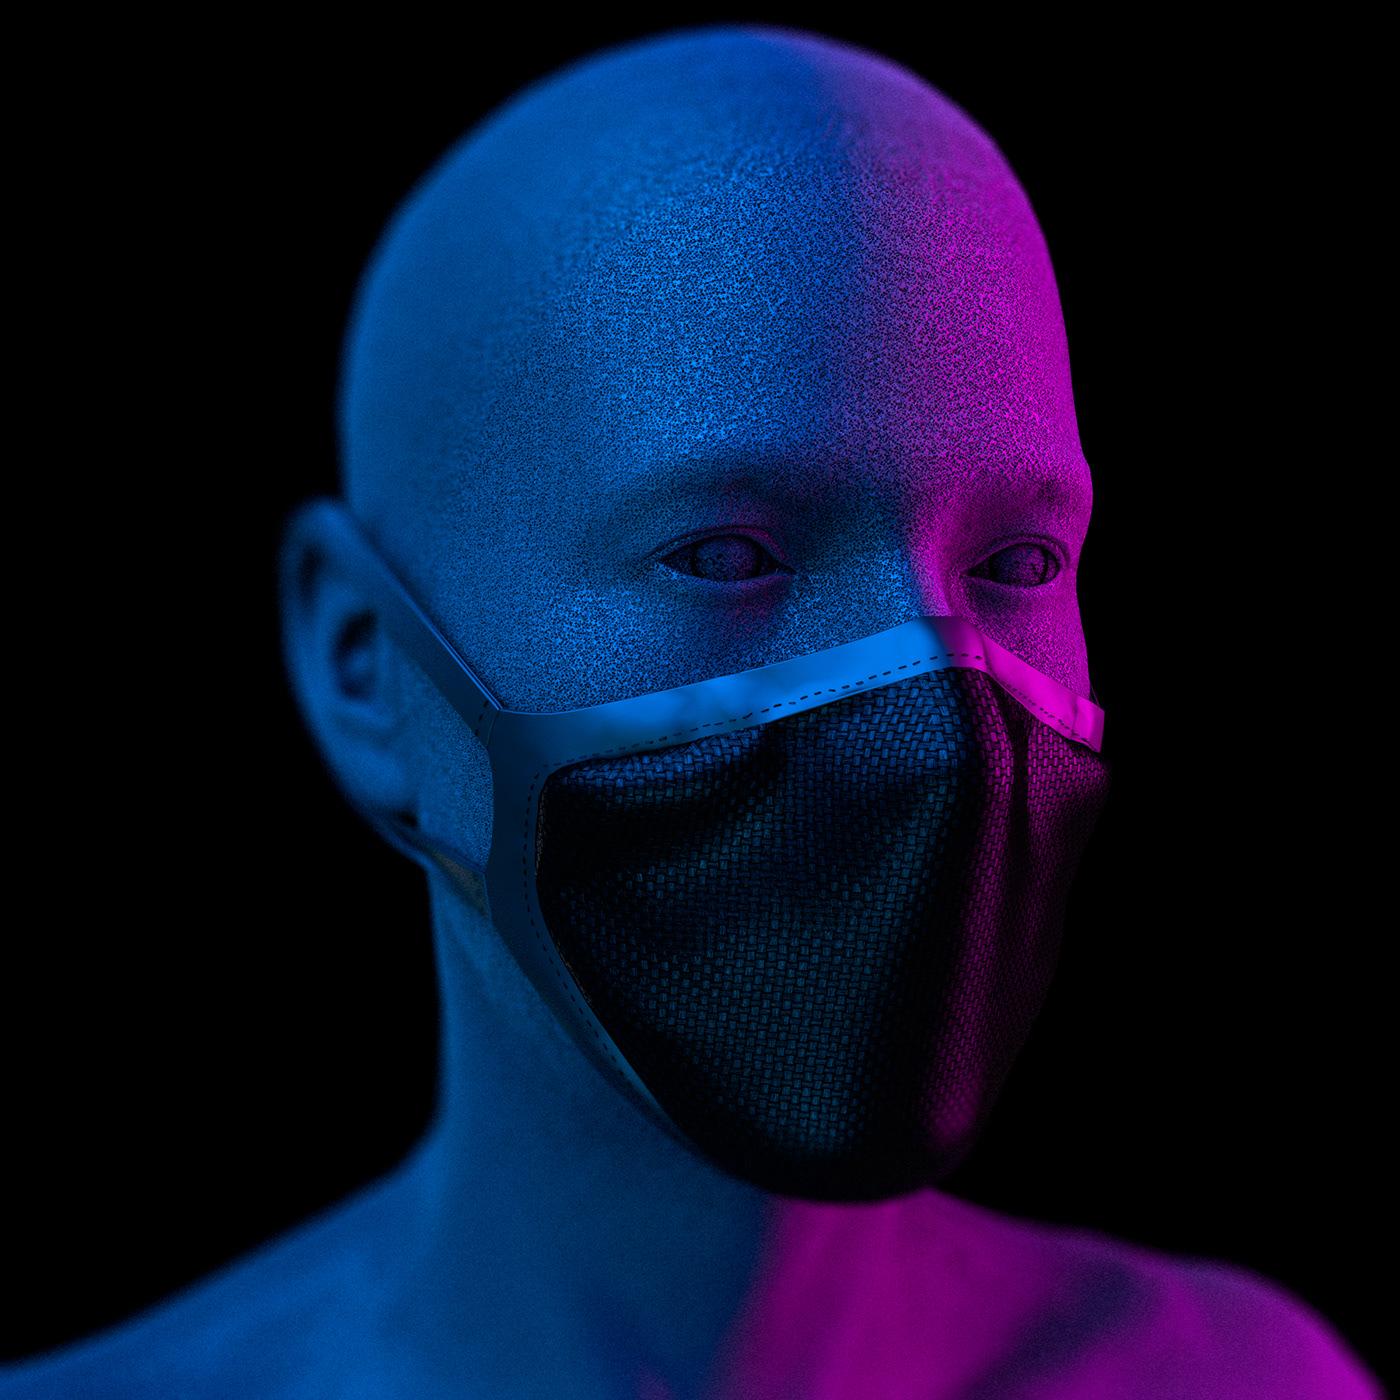 Face Mask Mockup - Free download (PSD) on Behance